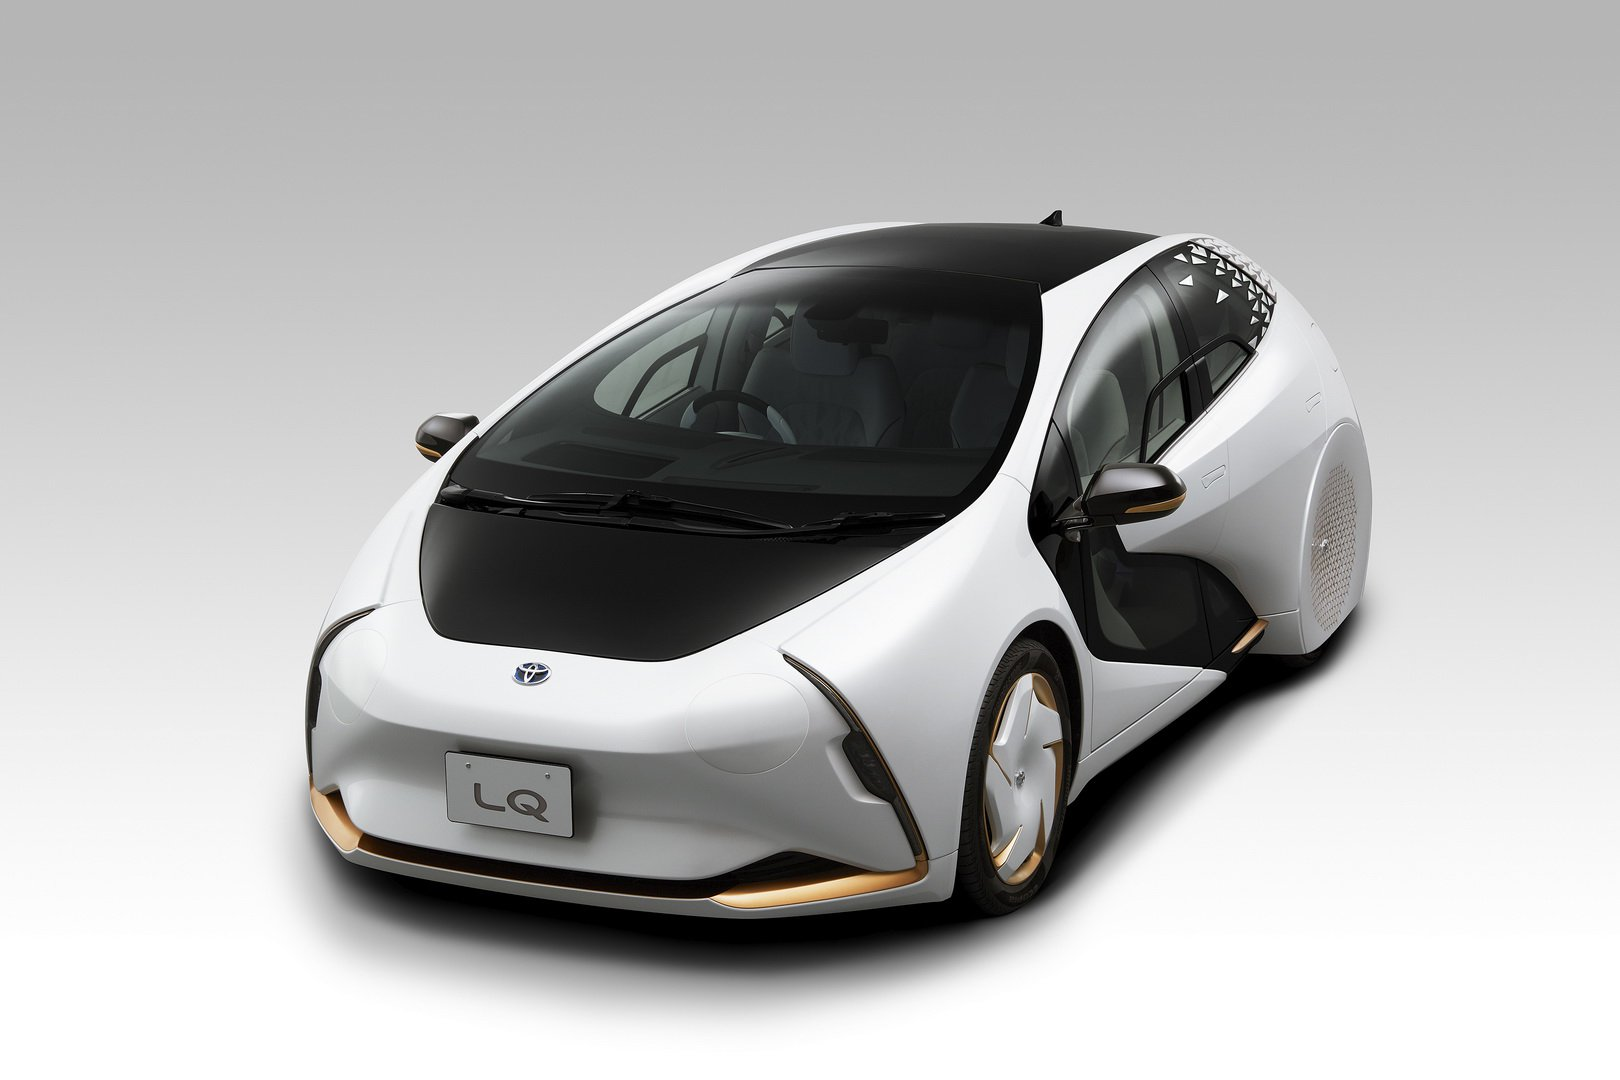 Toyota Lq Concept Tokyo (1)